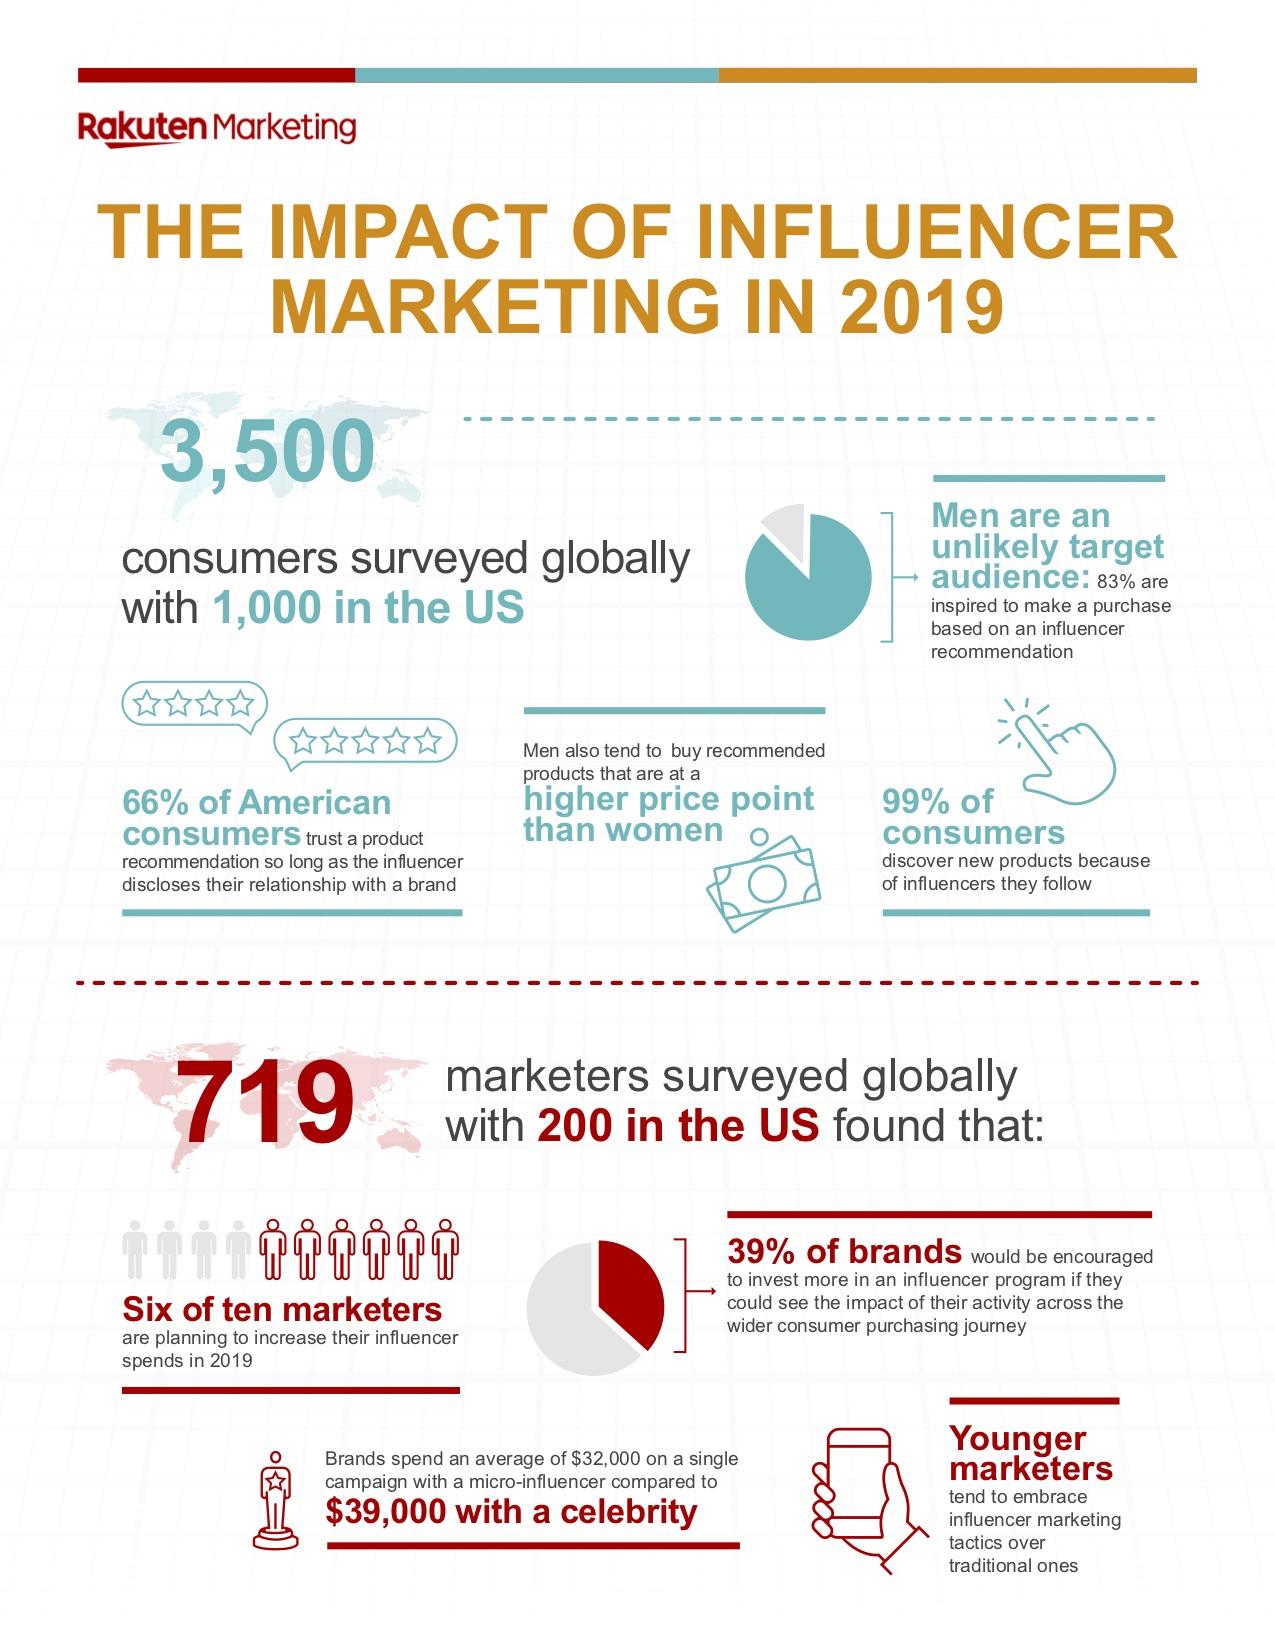 influencer marketing, 2019 influencer marketing global survey report, rakuten marketing influencer report, rakuten marketing, affiliate marketing